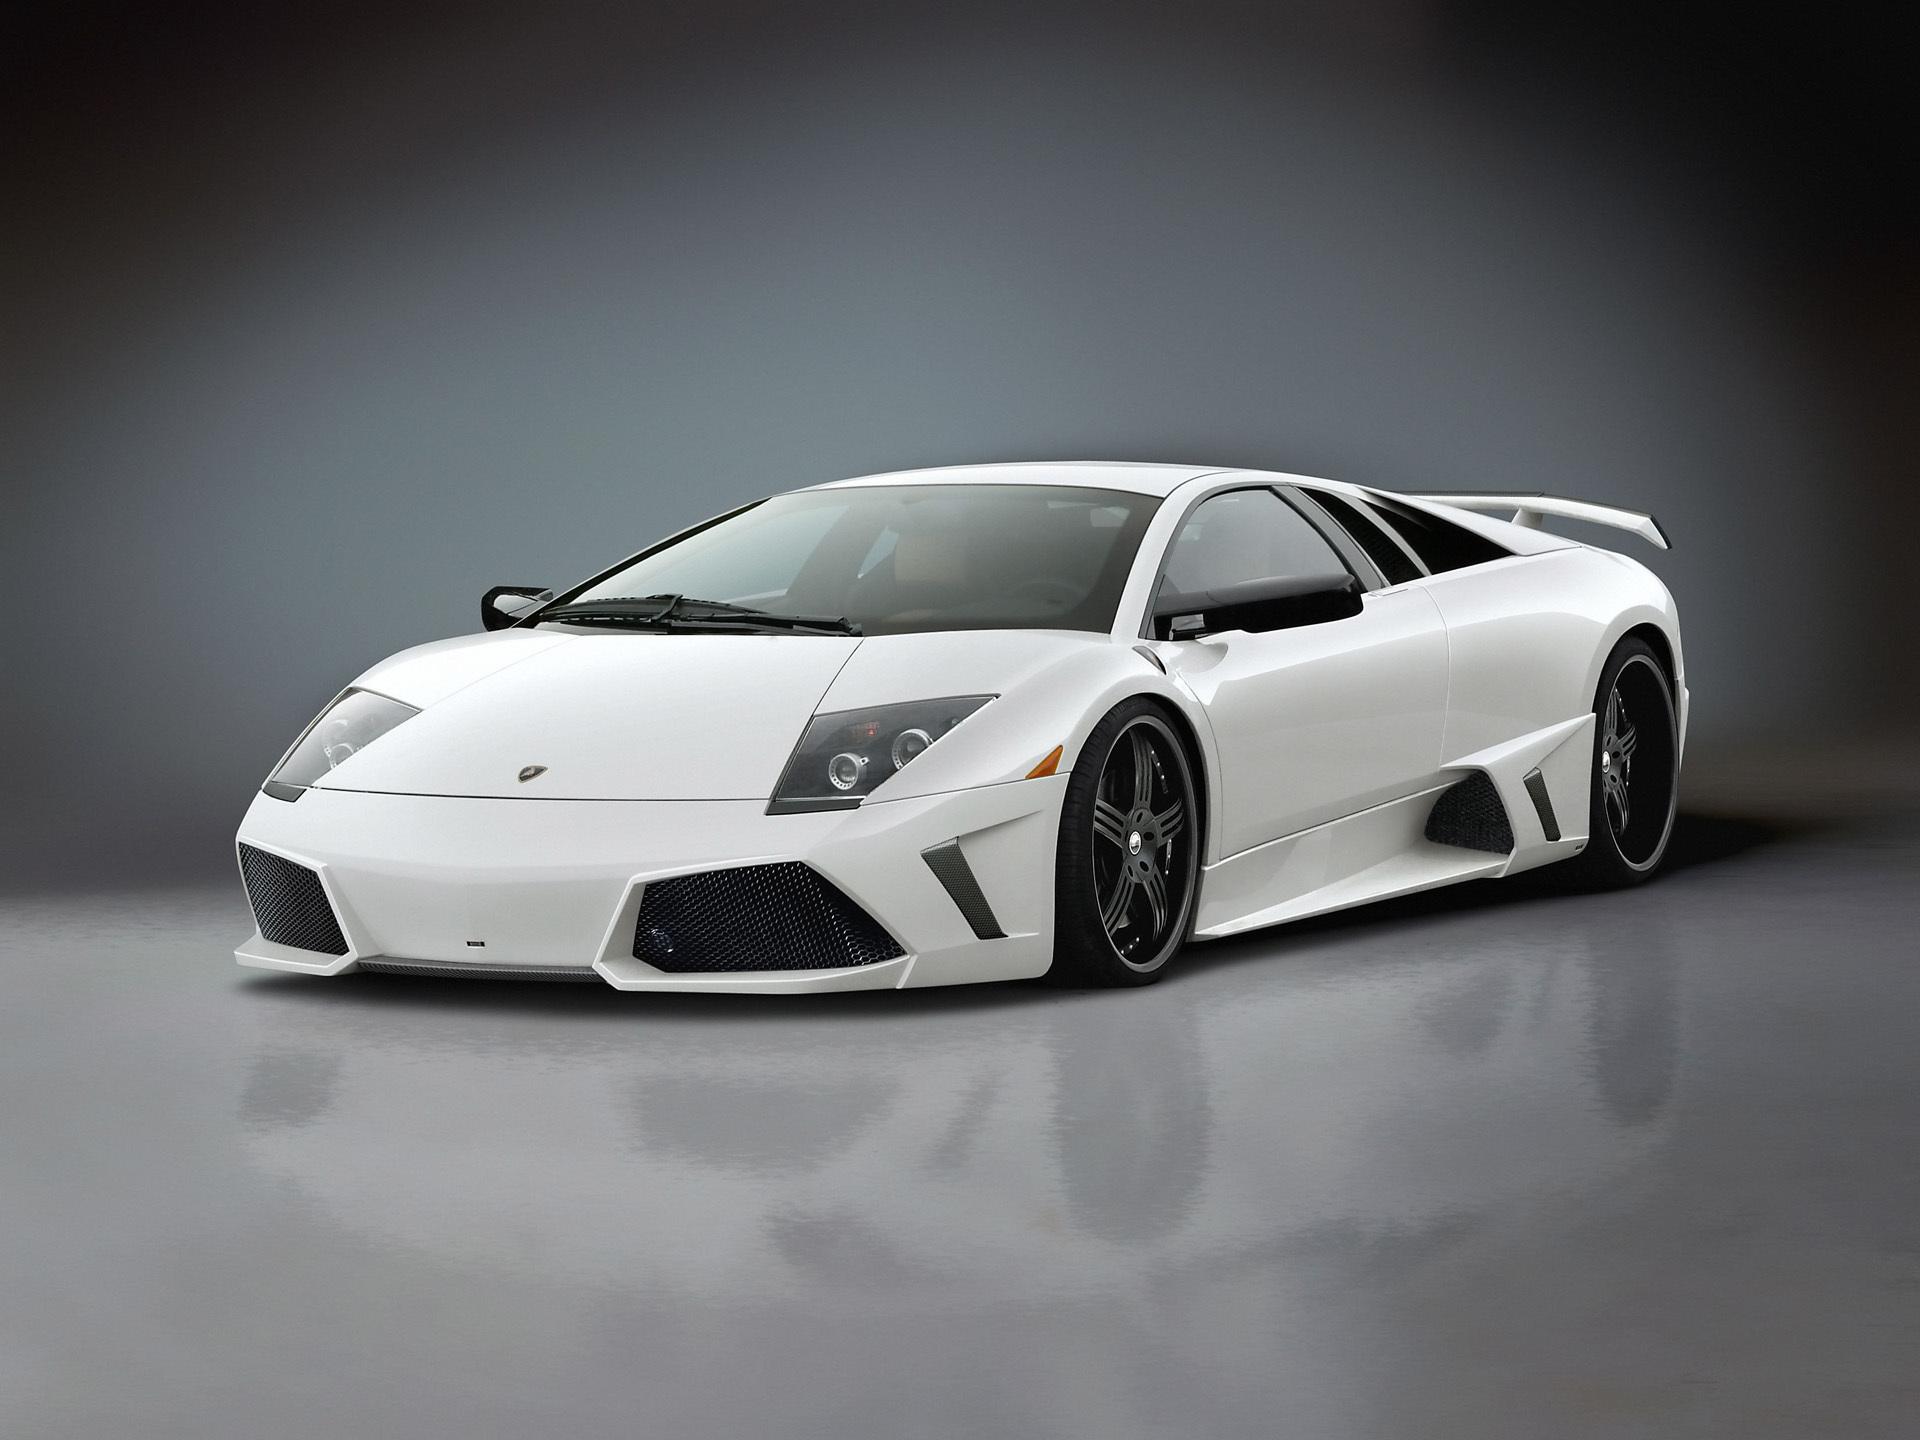 Lamborghini Murcielago Wallpapers Hq